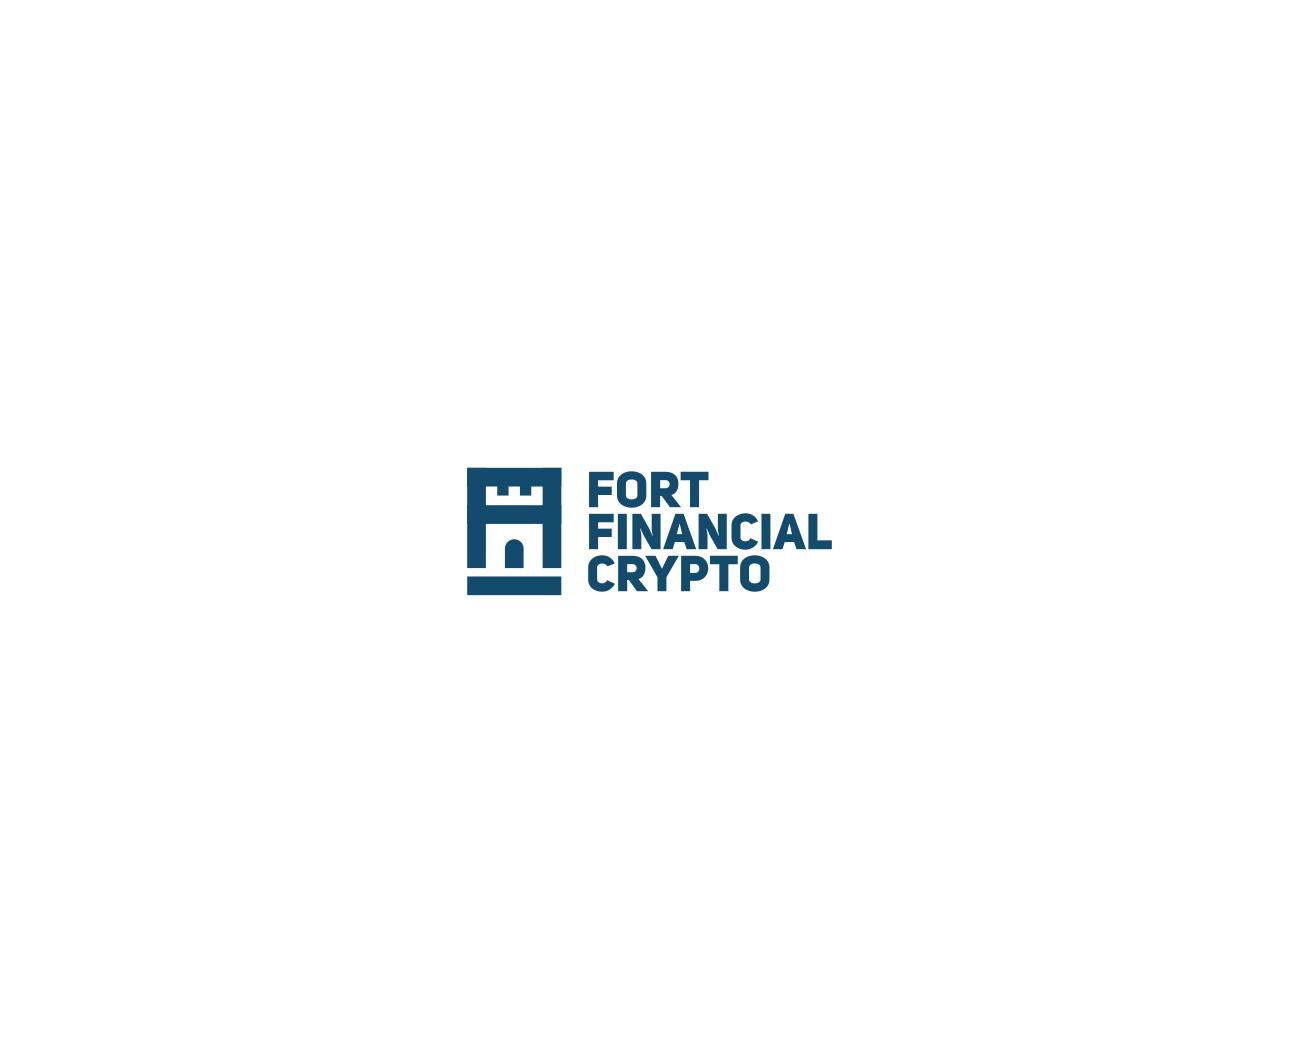 Разработка логотипа финансовой компании фото f_3275a8588844aca9.png